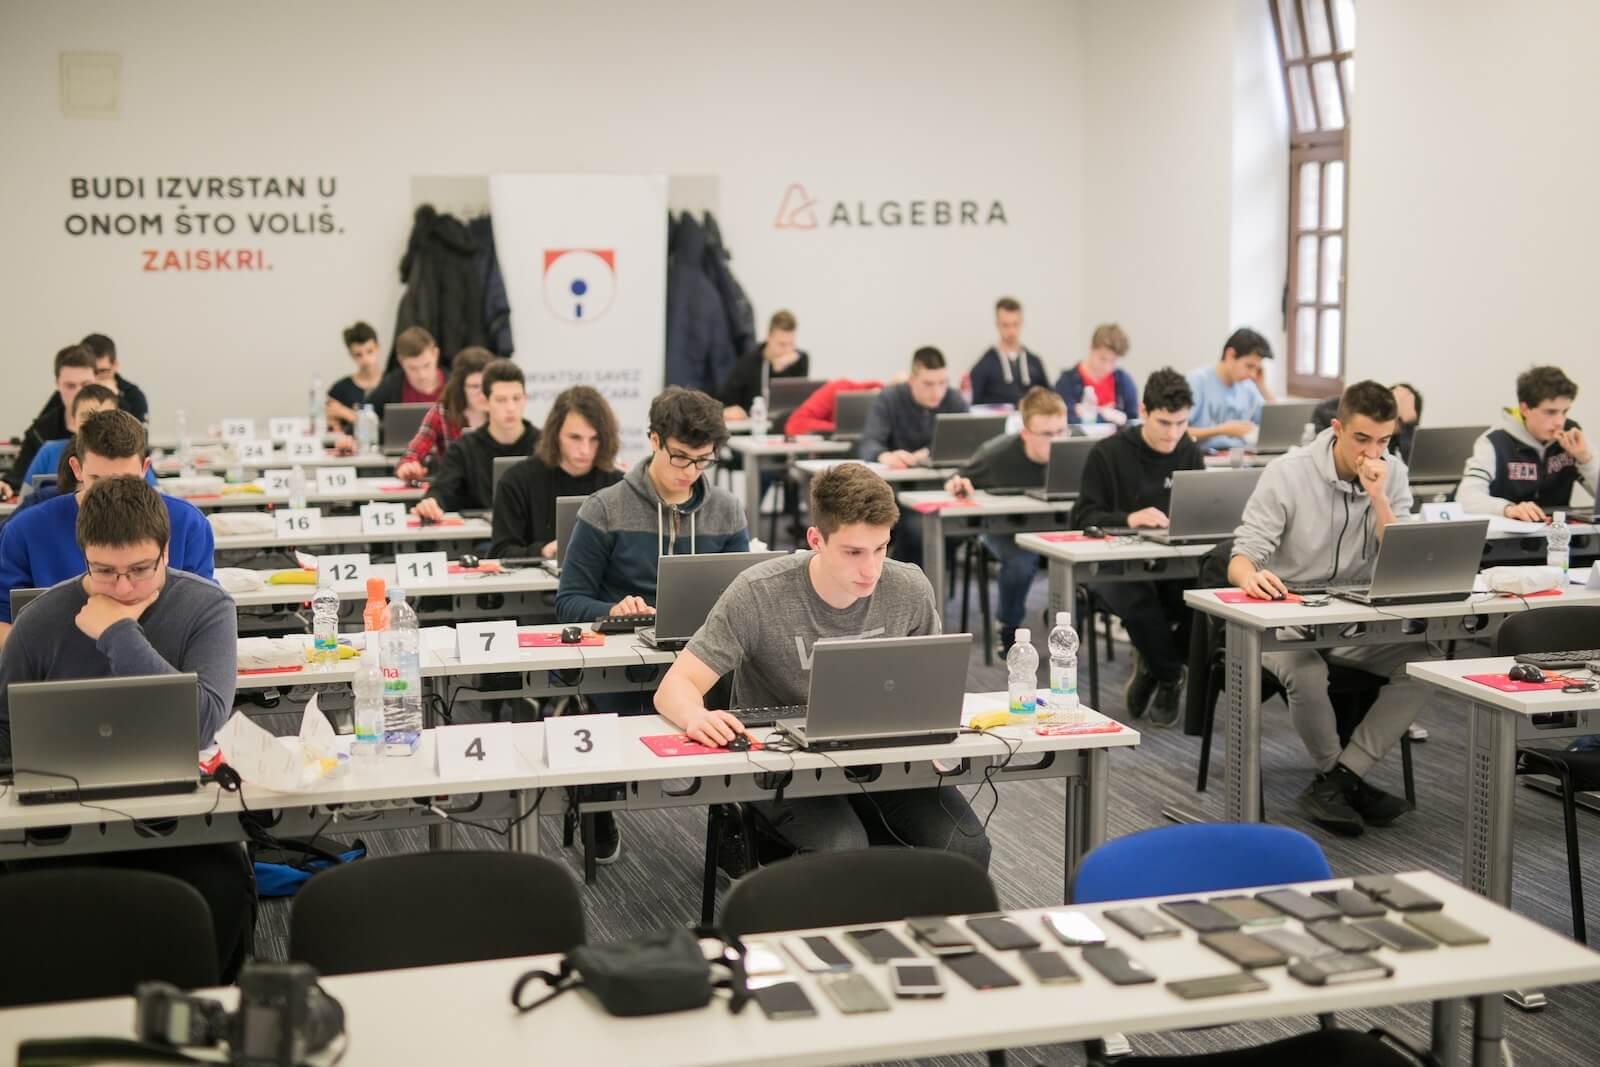 Zagrebačke škole dominirale na informatičkoj olimpijadi i juniorskoj olimpijadi